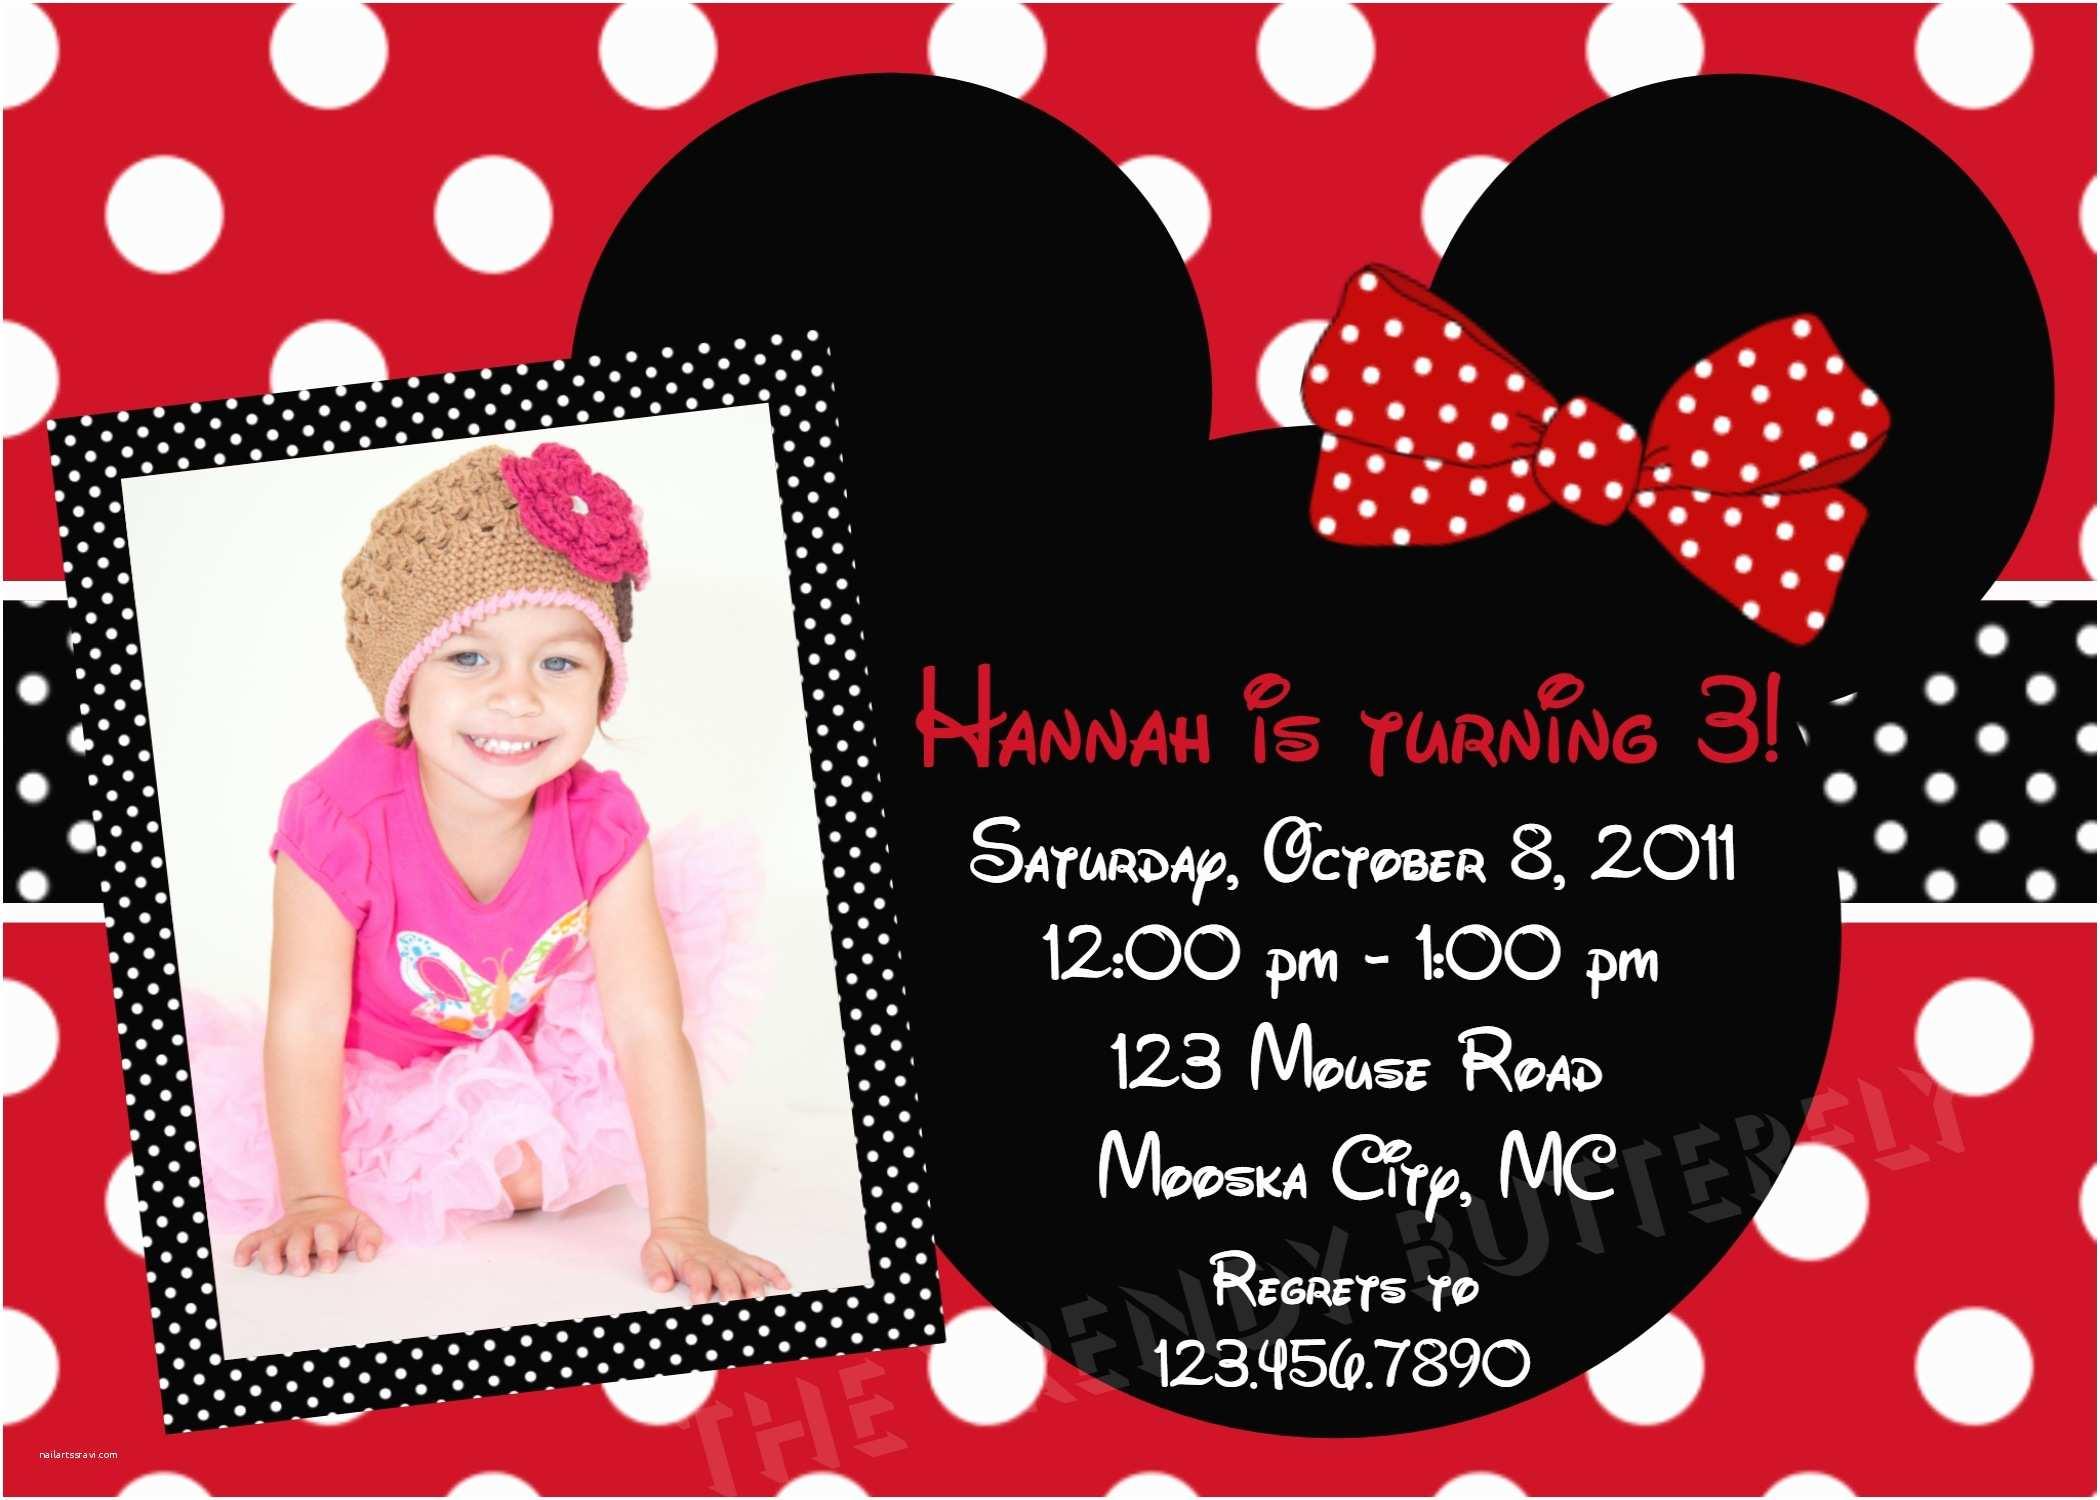 Minnie Mouse Birthday Party Invitations Minnie Mouse Birthday Invitations Walmart – Amazing